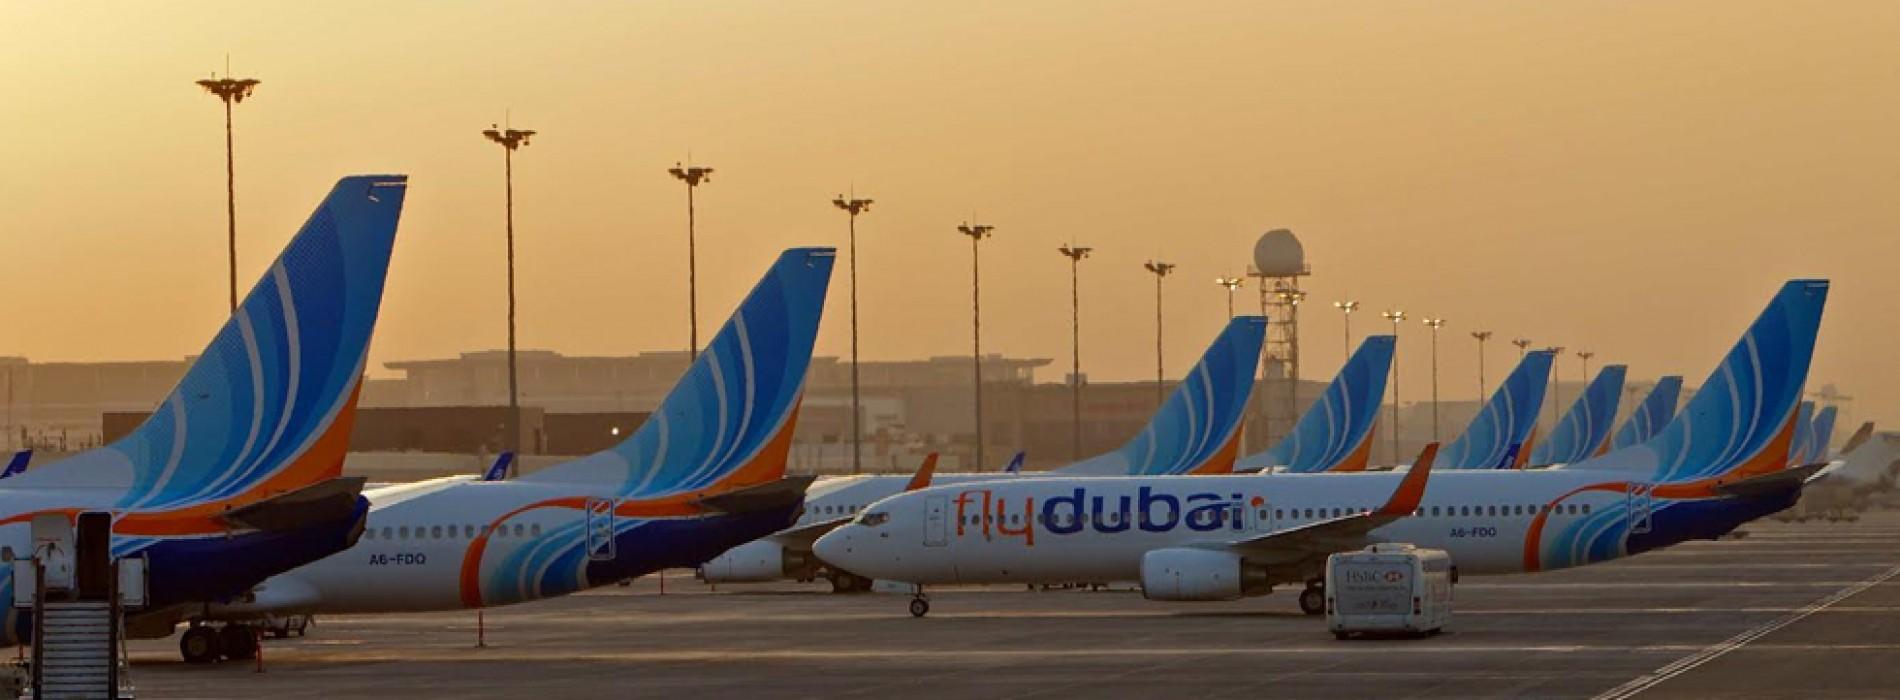 flydubai announces 14.4% passenger growth to 10.4 million and profit of AED 31.6 million